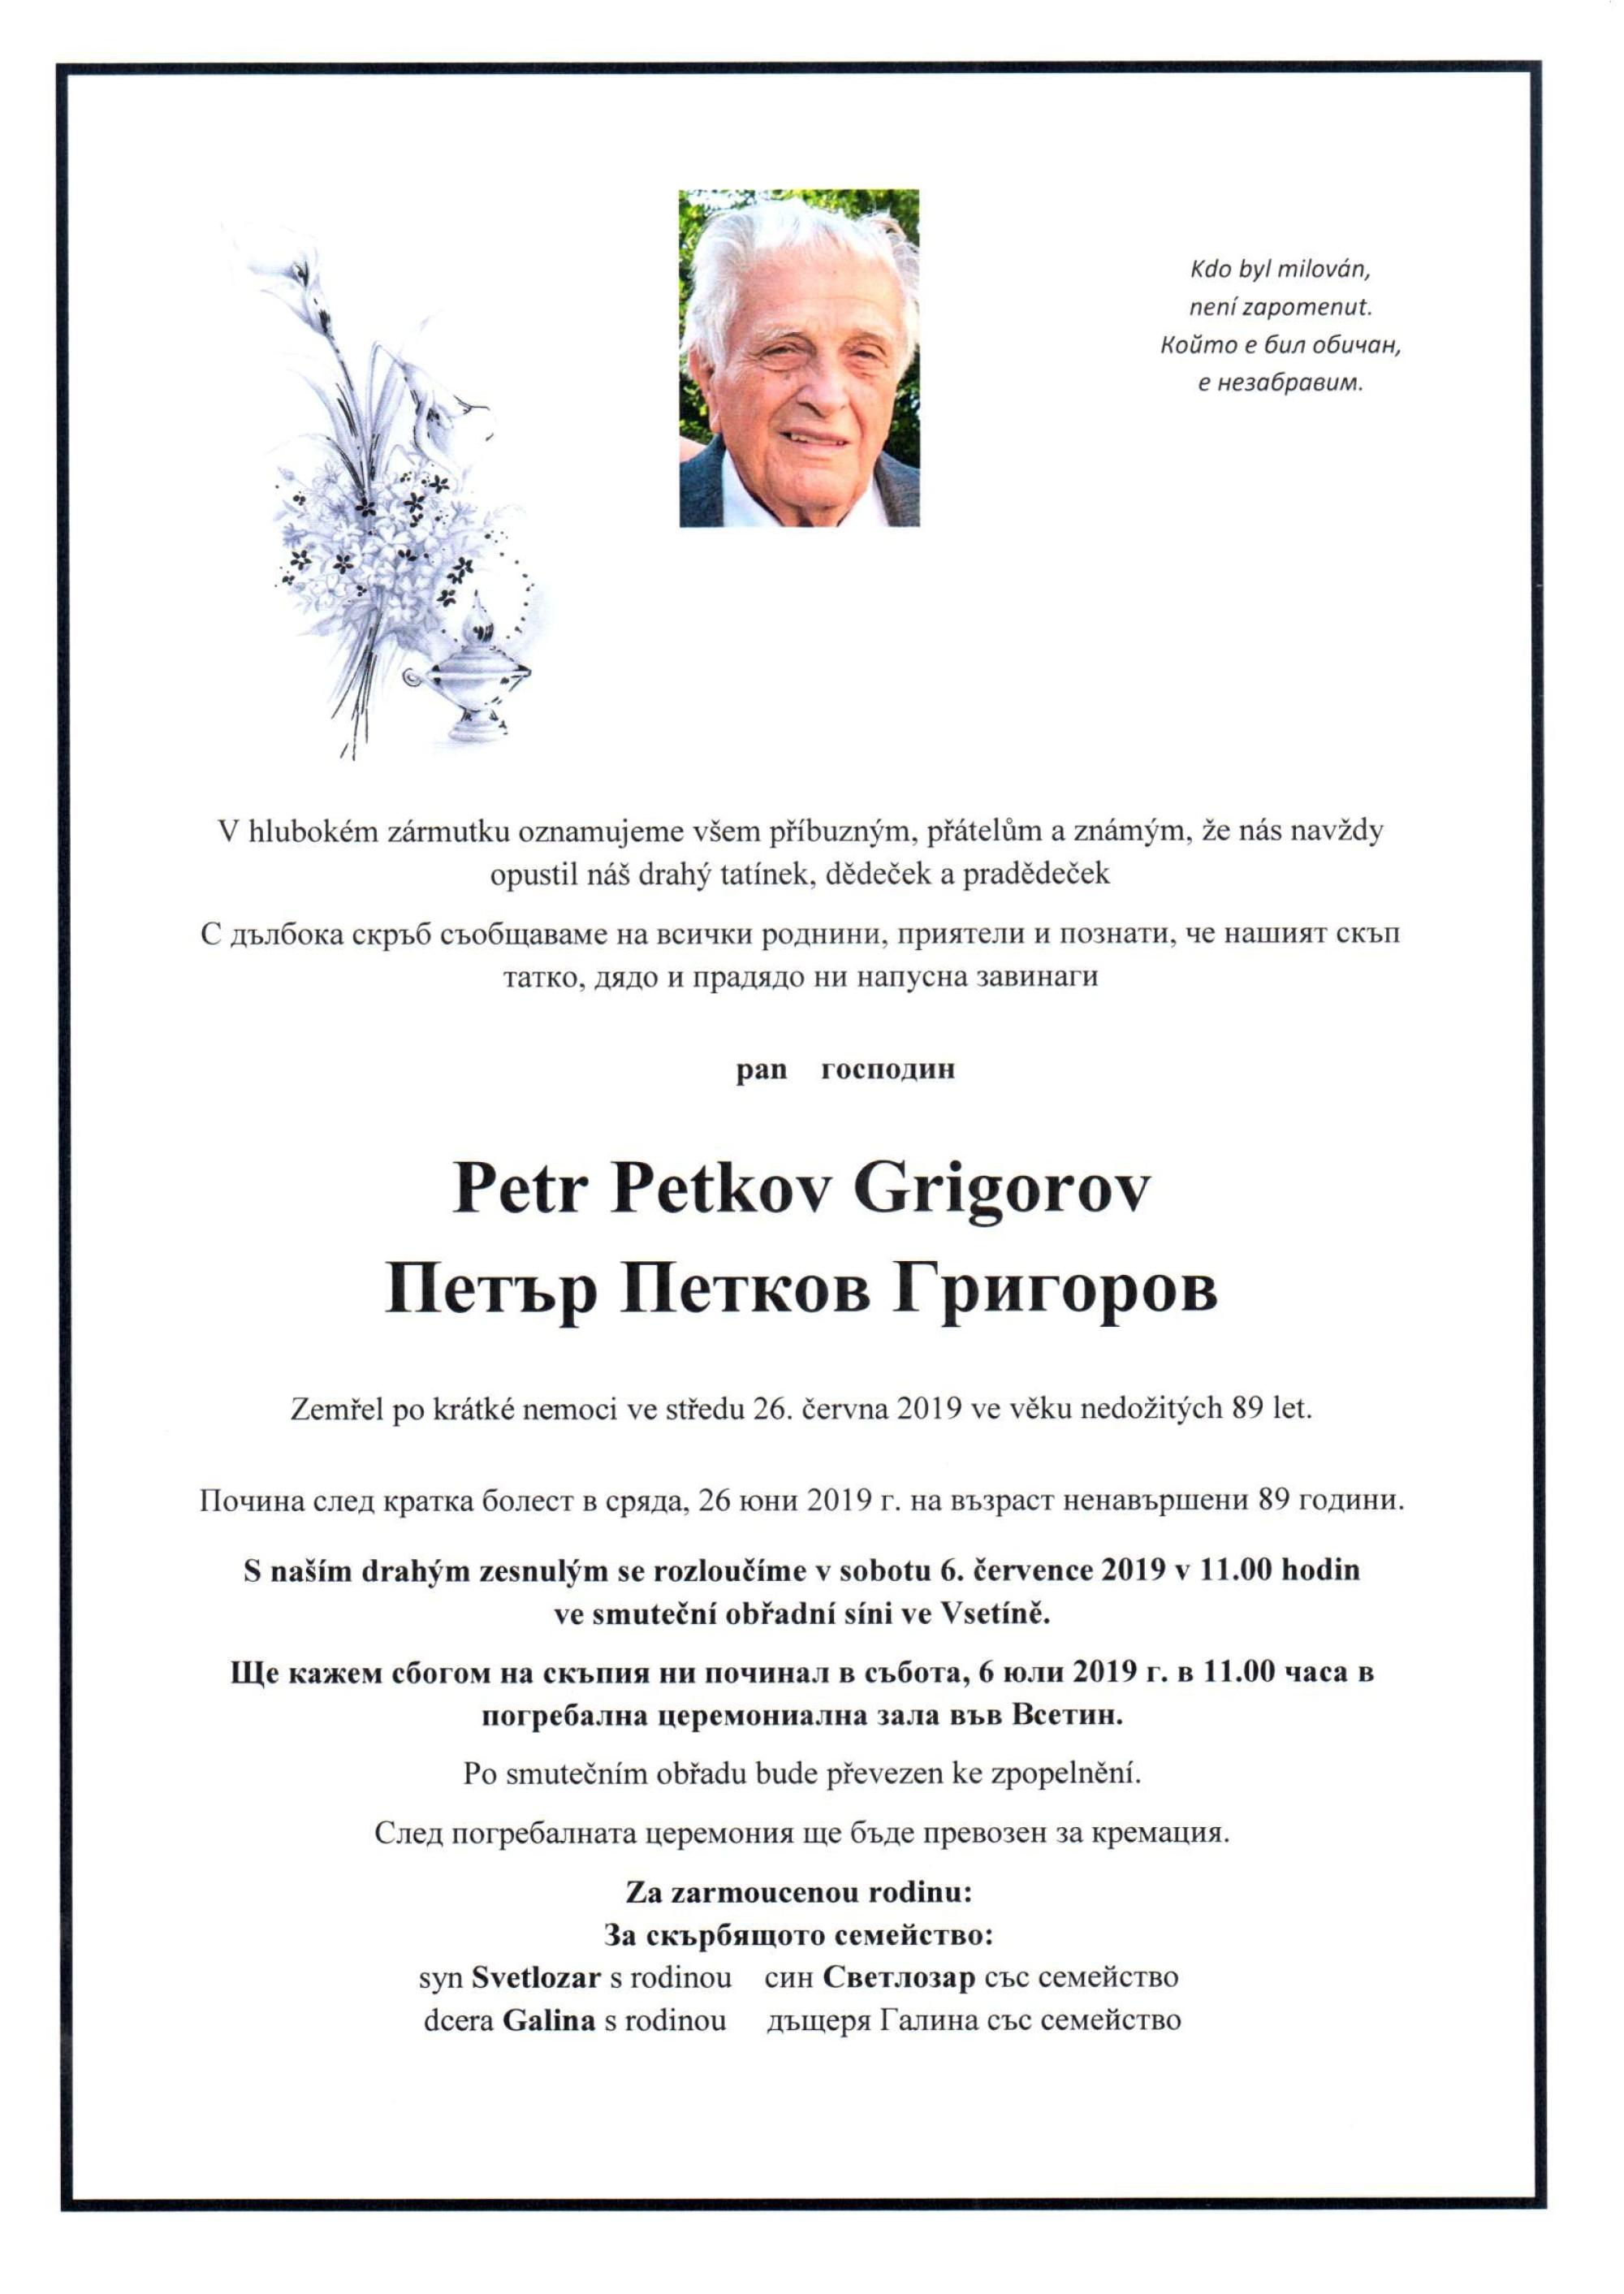 Petr Petkov Grigorov